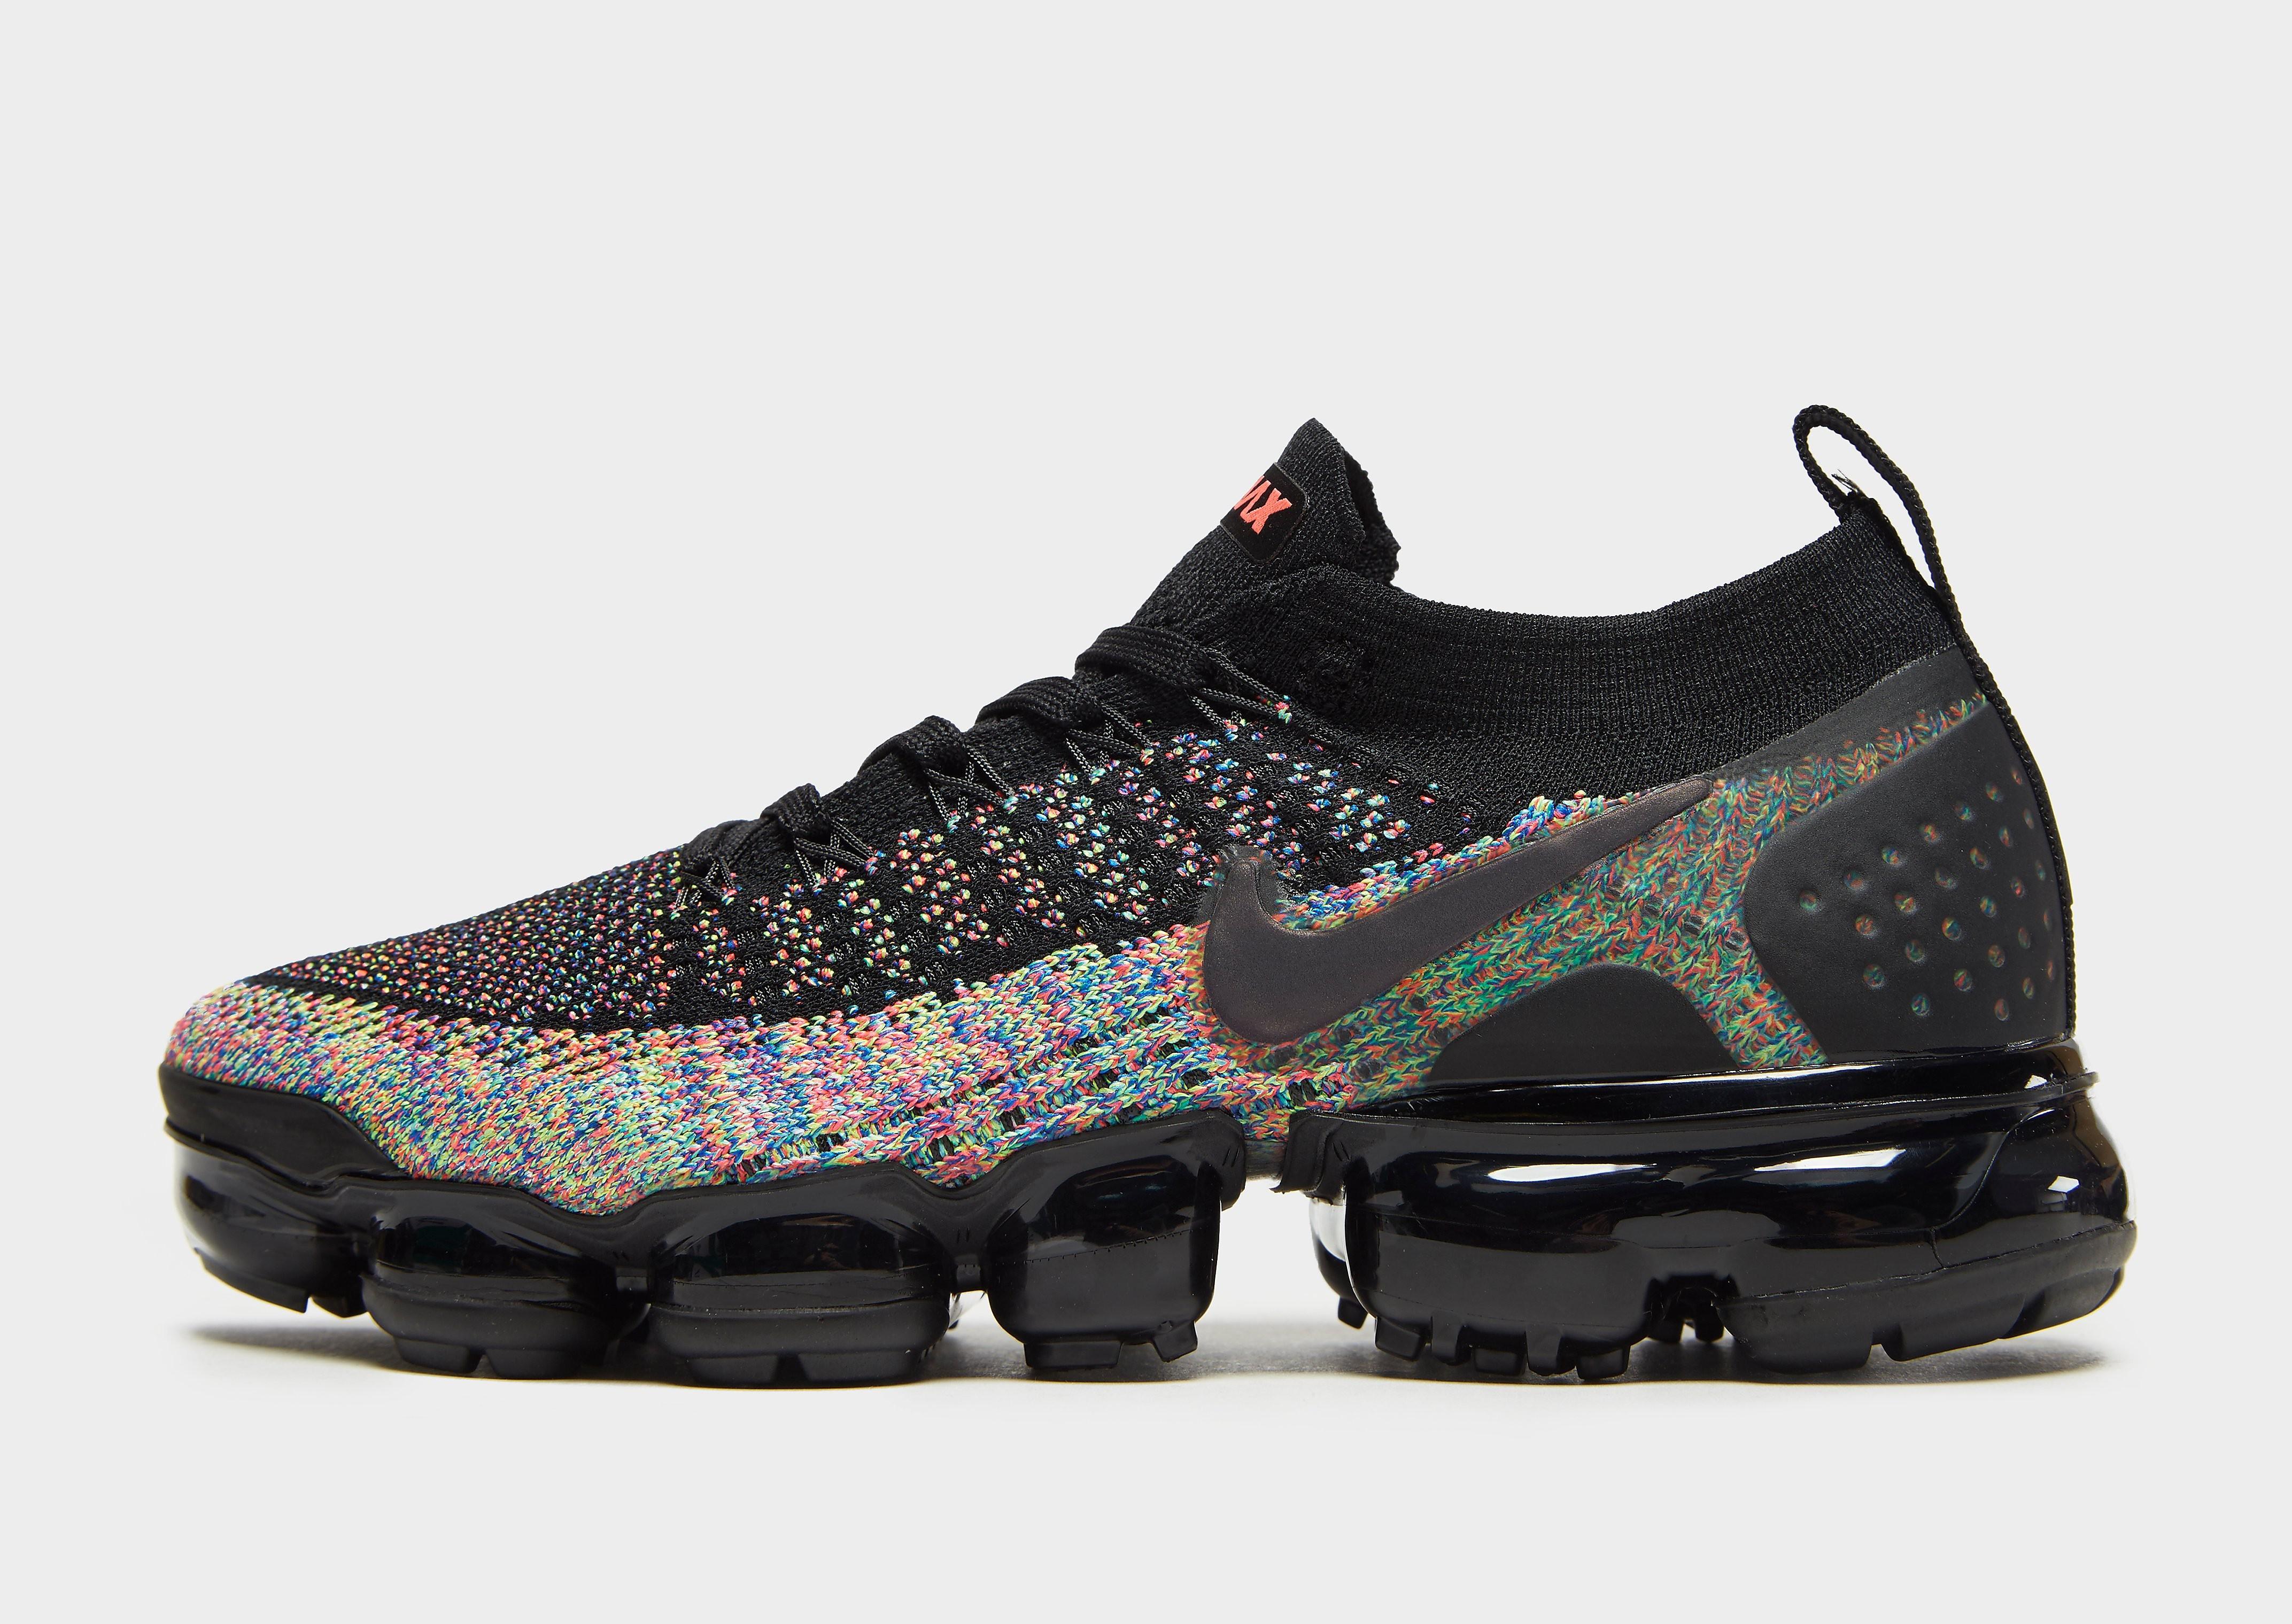 Nike Air VaporMax damessneaker zwart en multicolor